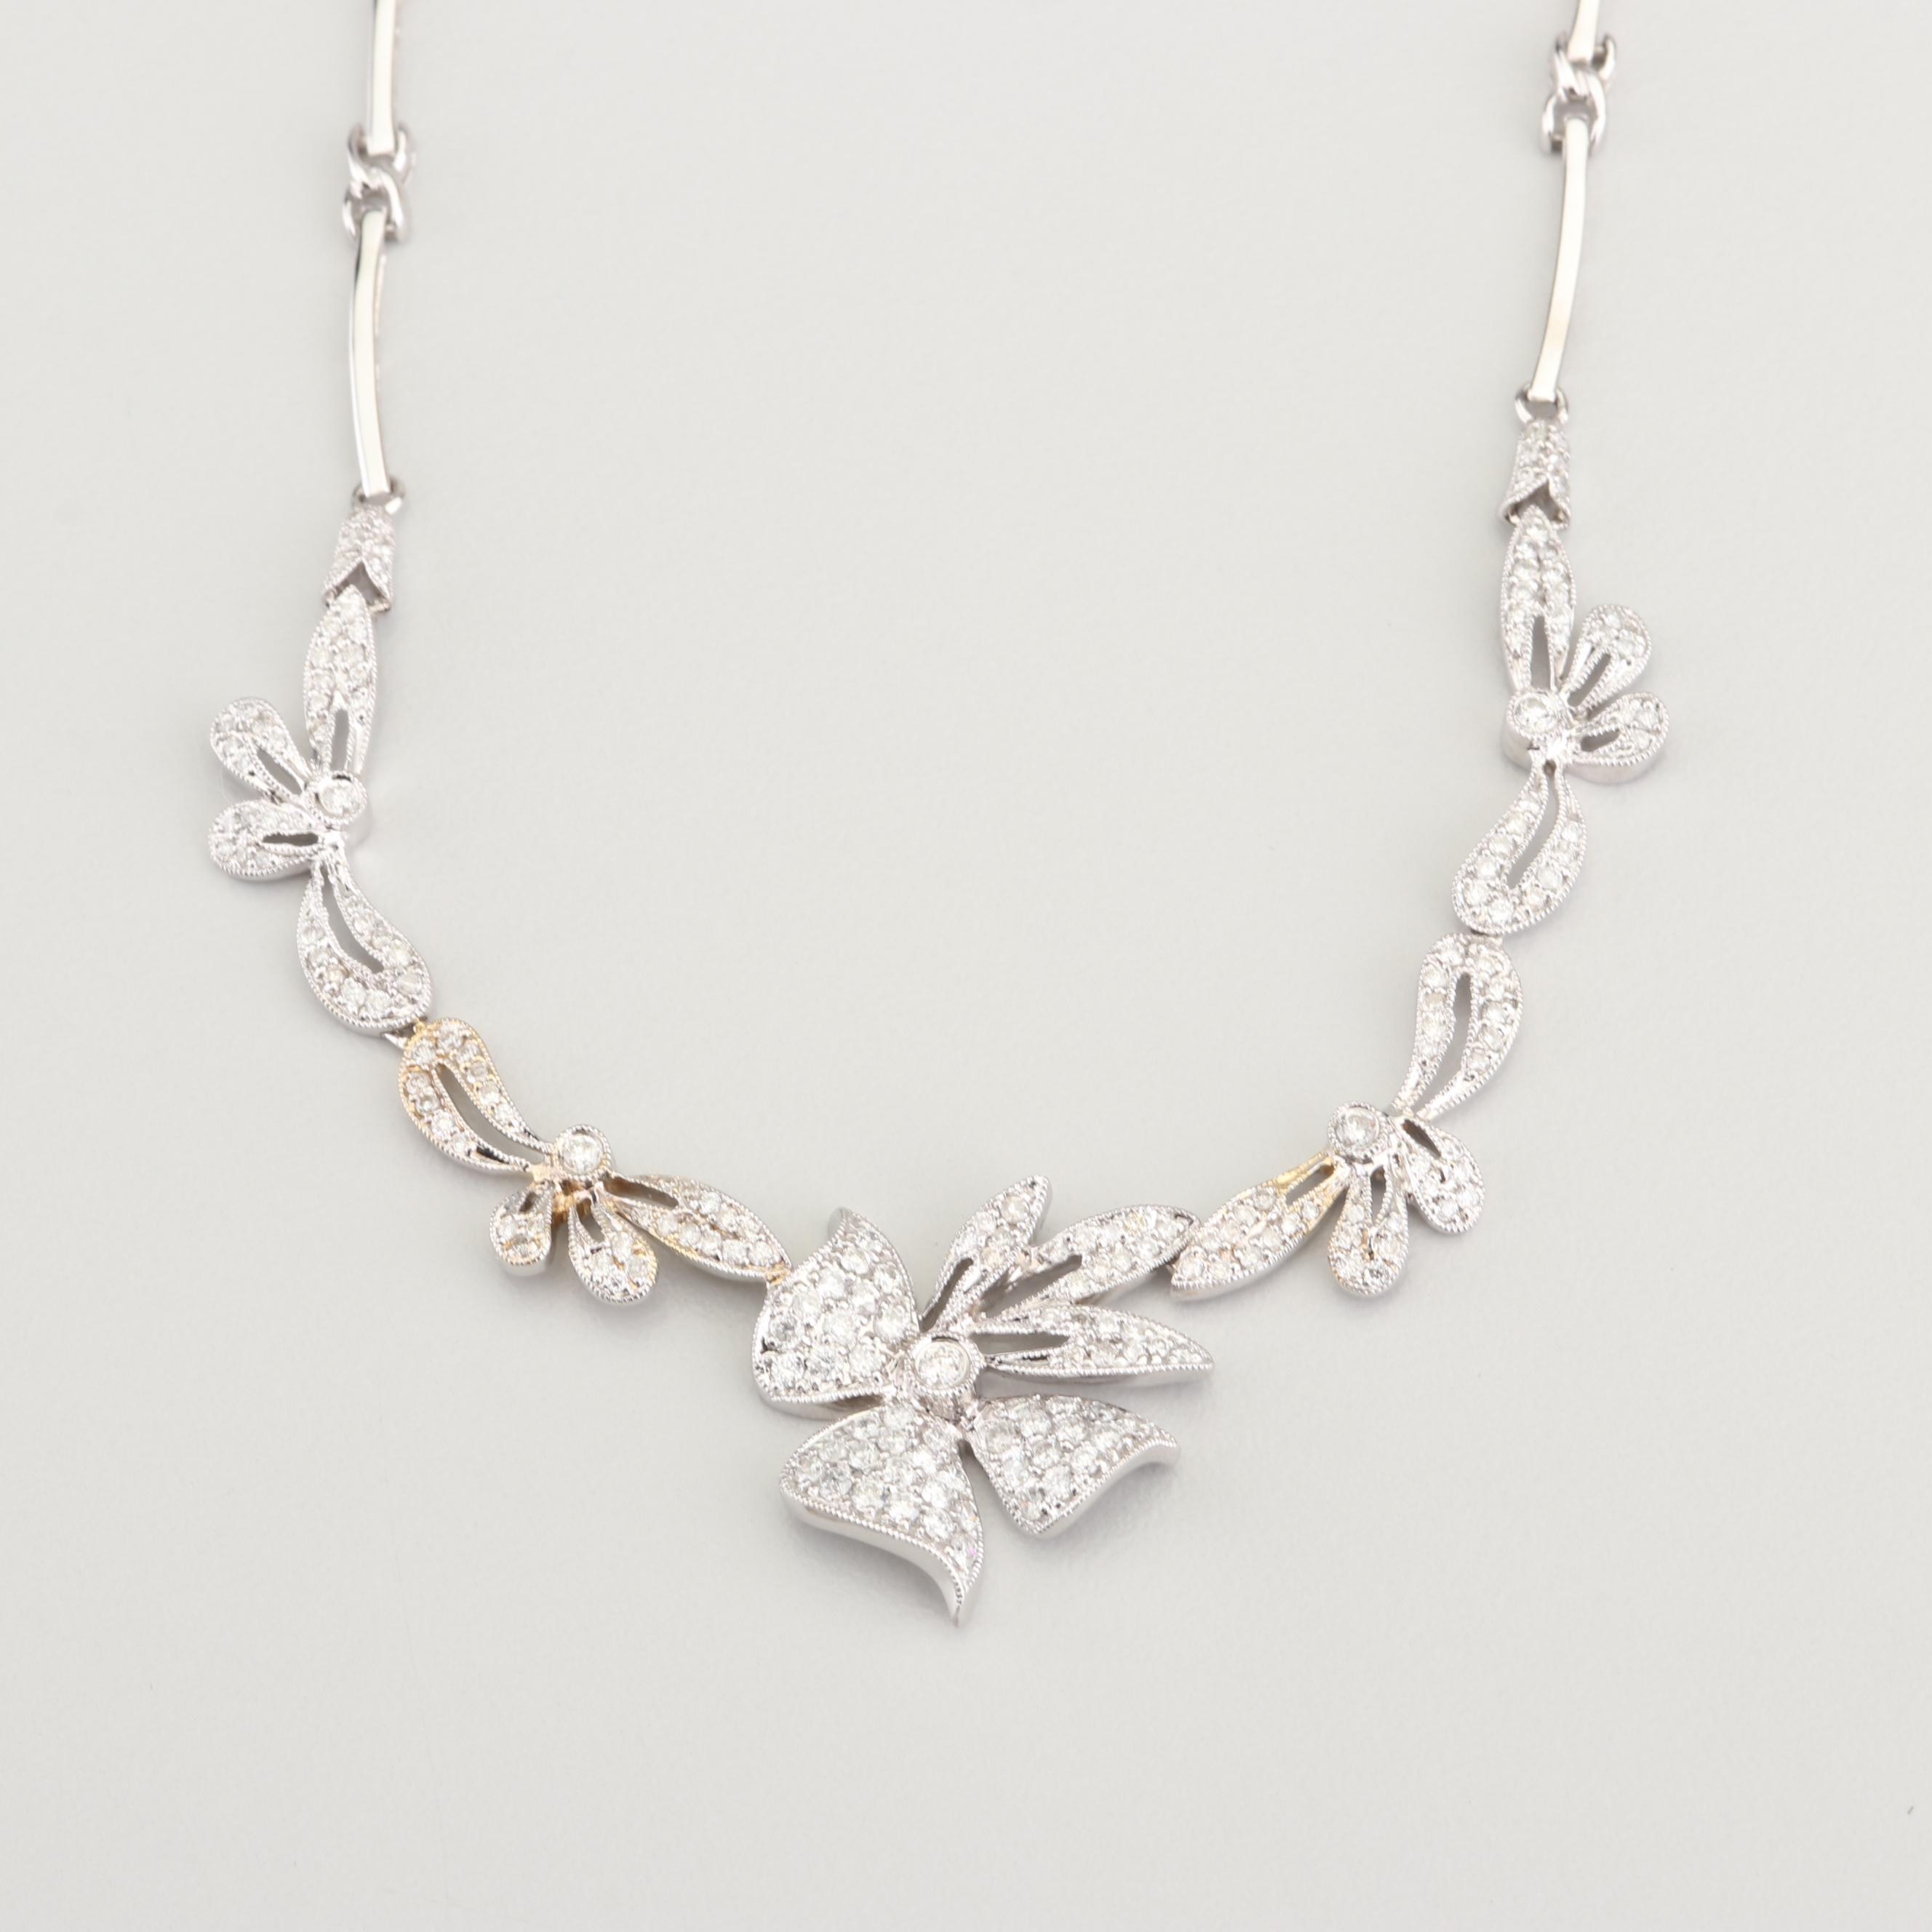 14K White Gold 1.48 CTW Diamond Necklace